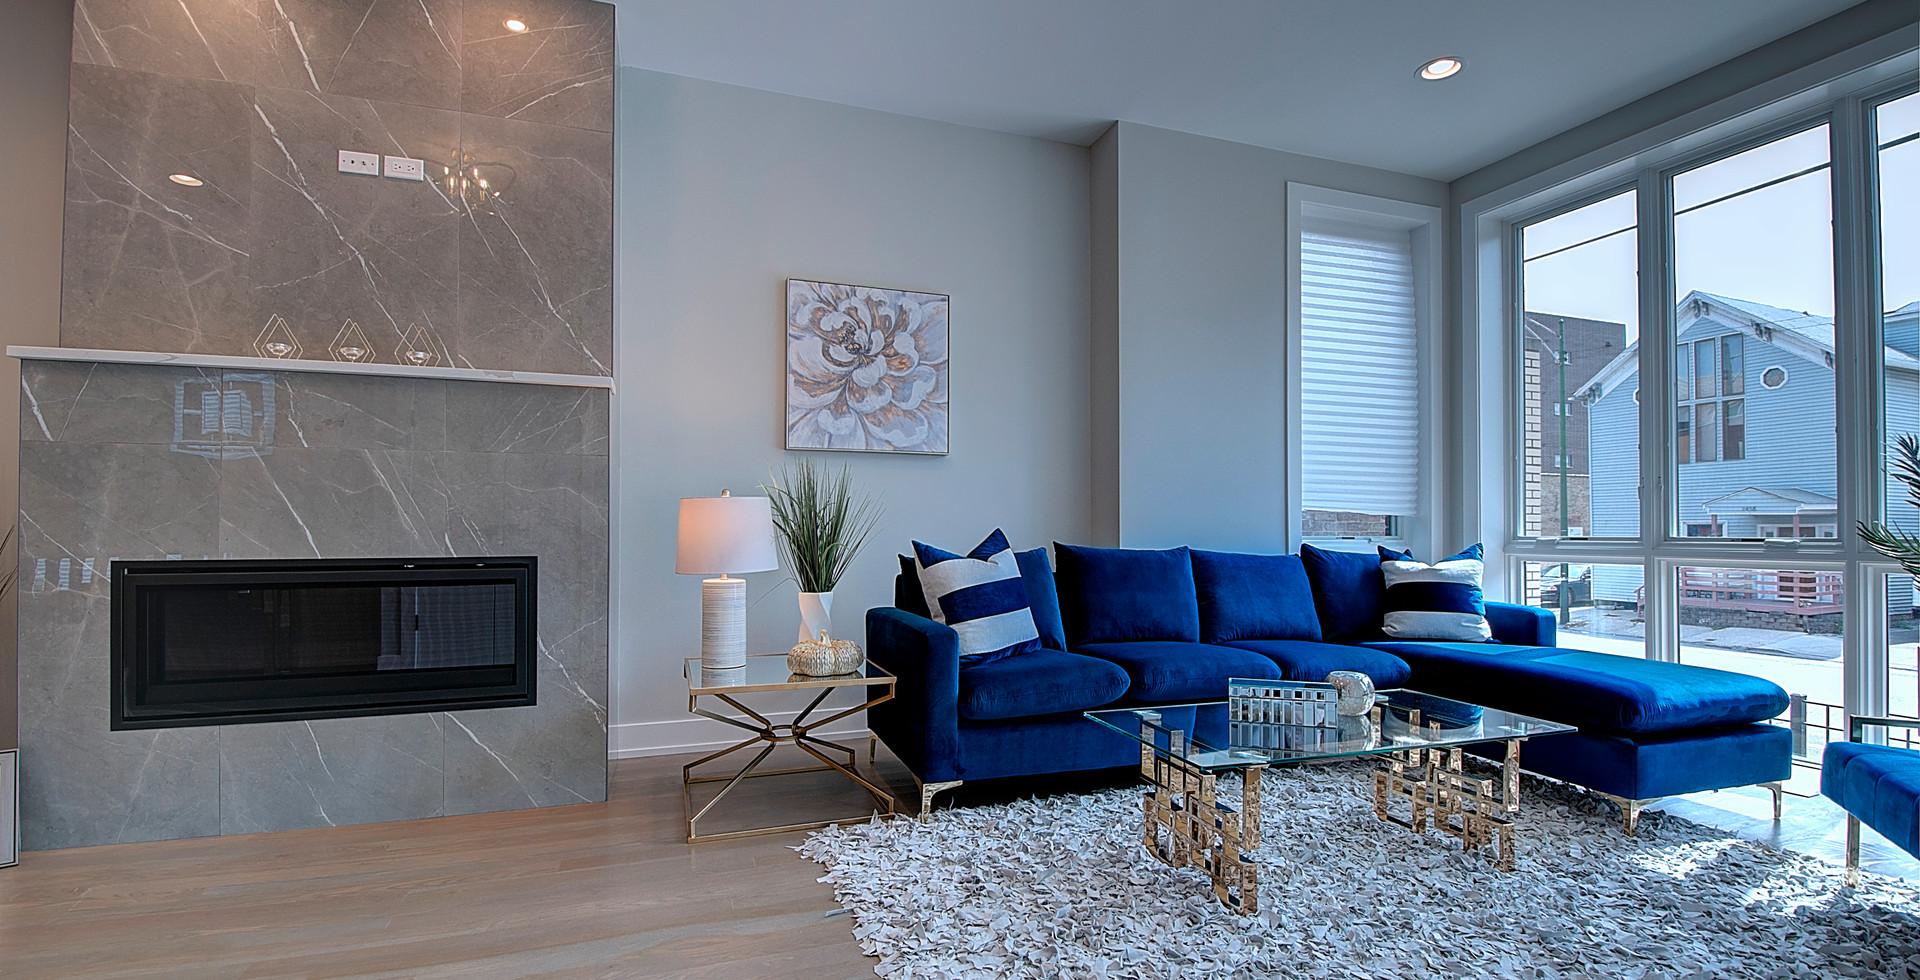 Living Room in Carol Stream designed by MRM Home Design.jpg